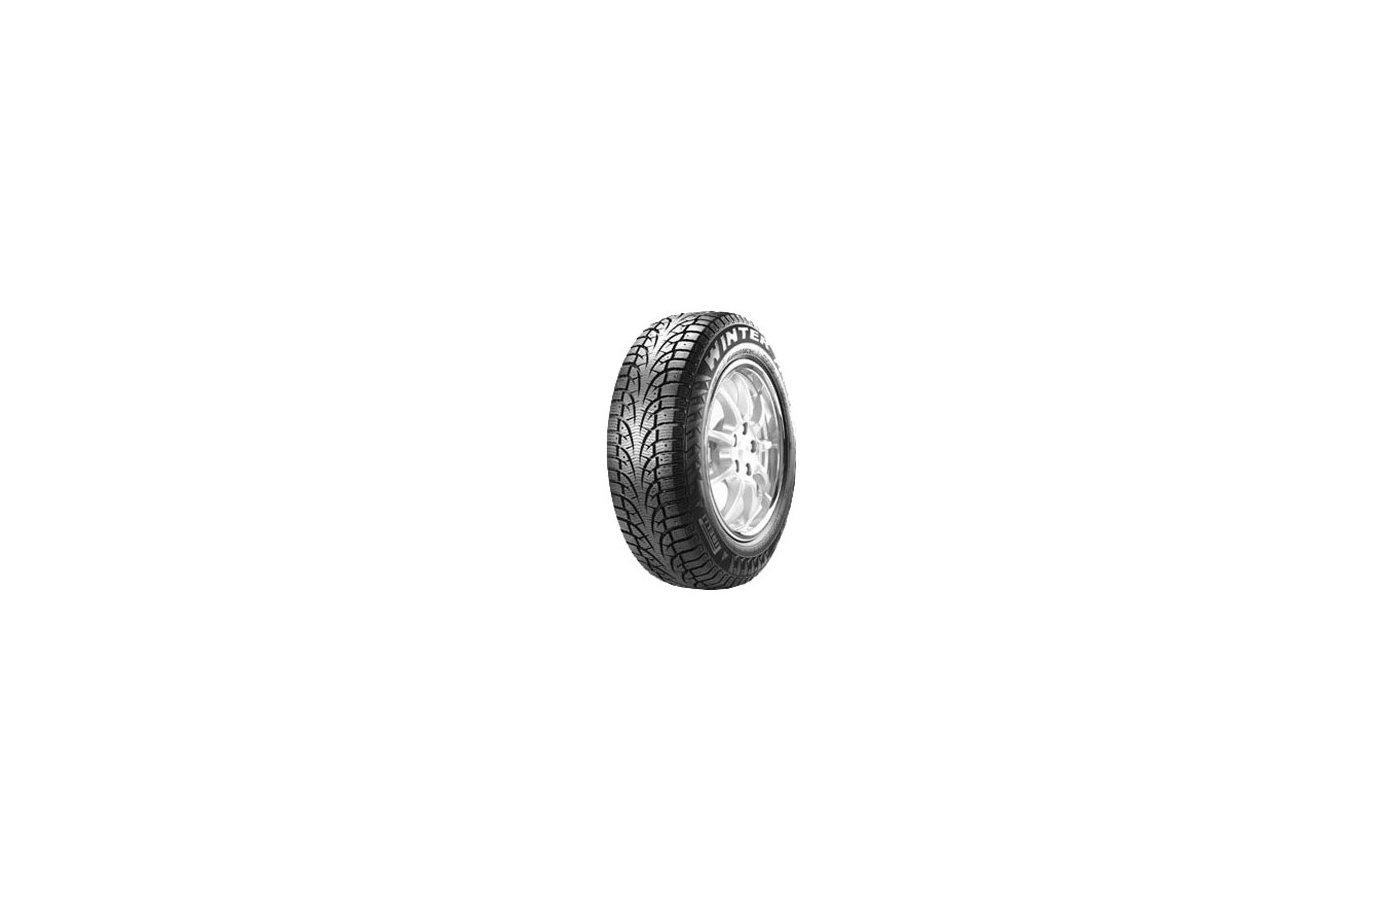 Шина Pirelli Winter Carving Edge 175/65 R14 TL 82T шип